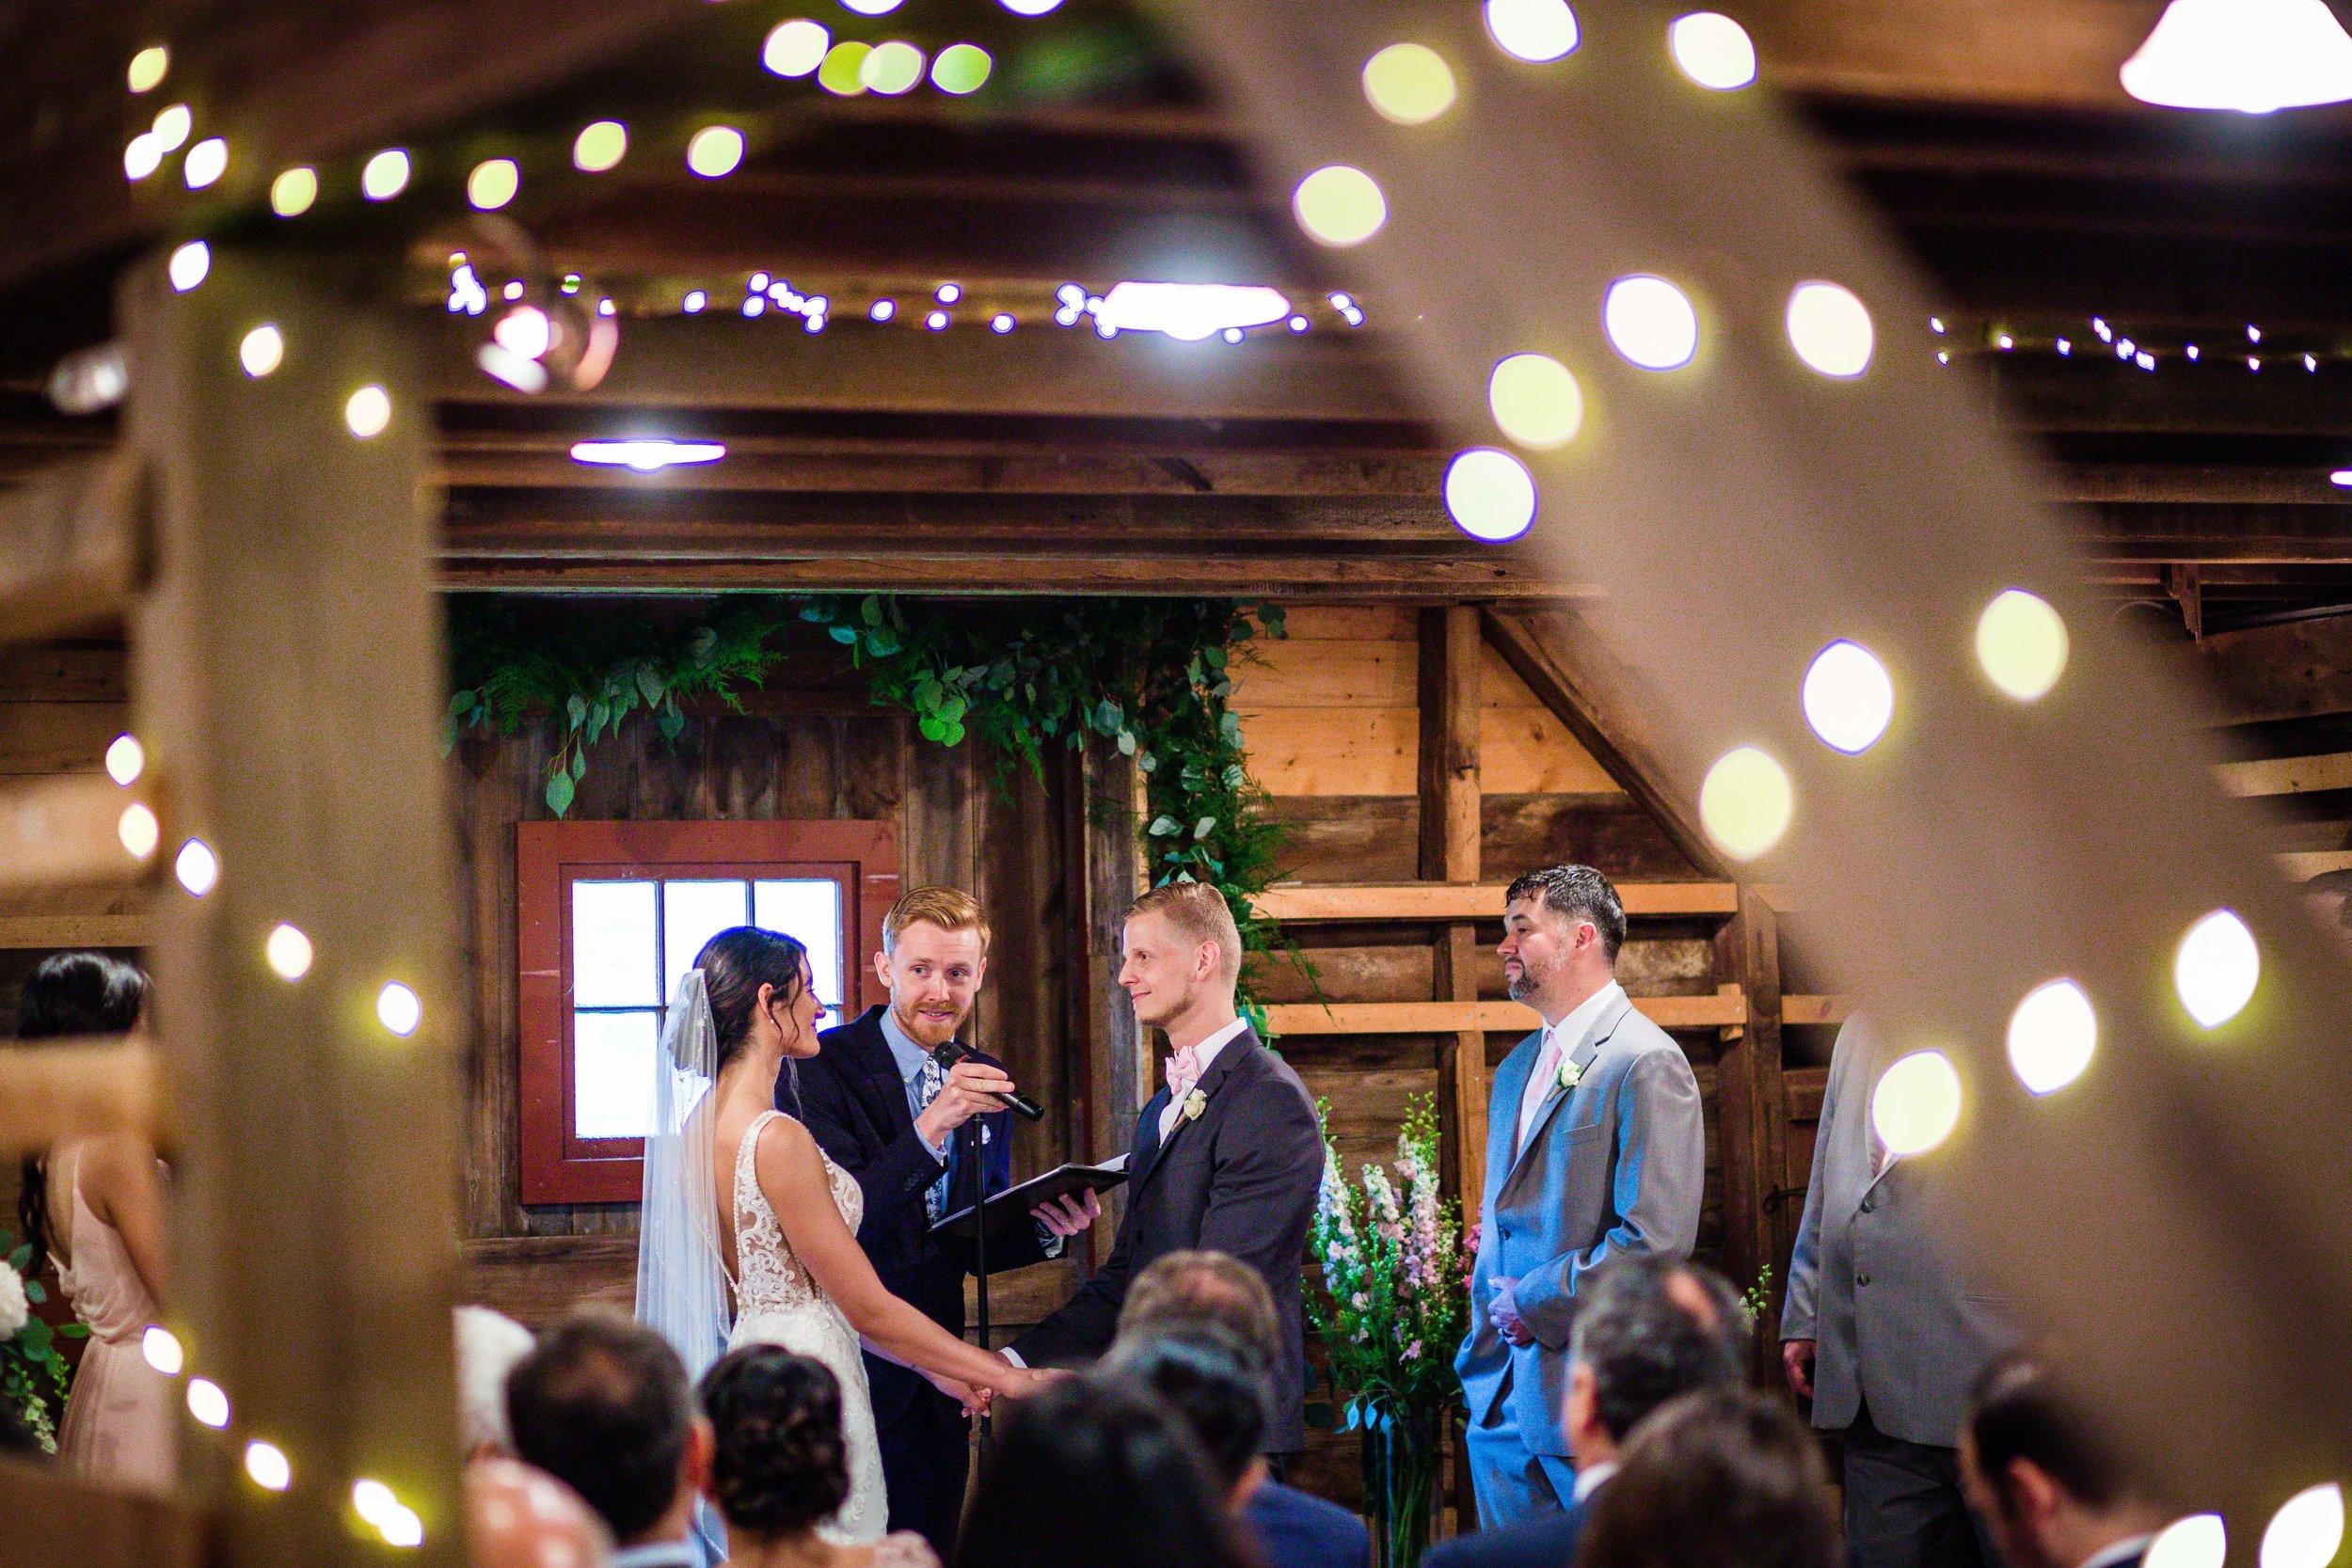 PRALLISVILLE MILLS NEW HOPE WEDDING PHOTOGRAPHY-71.jpg